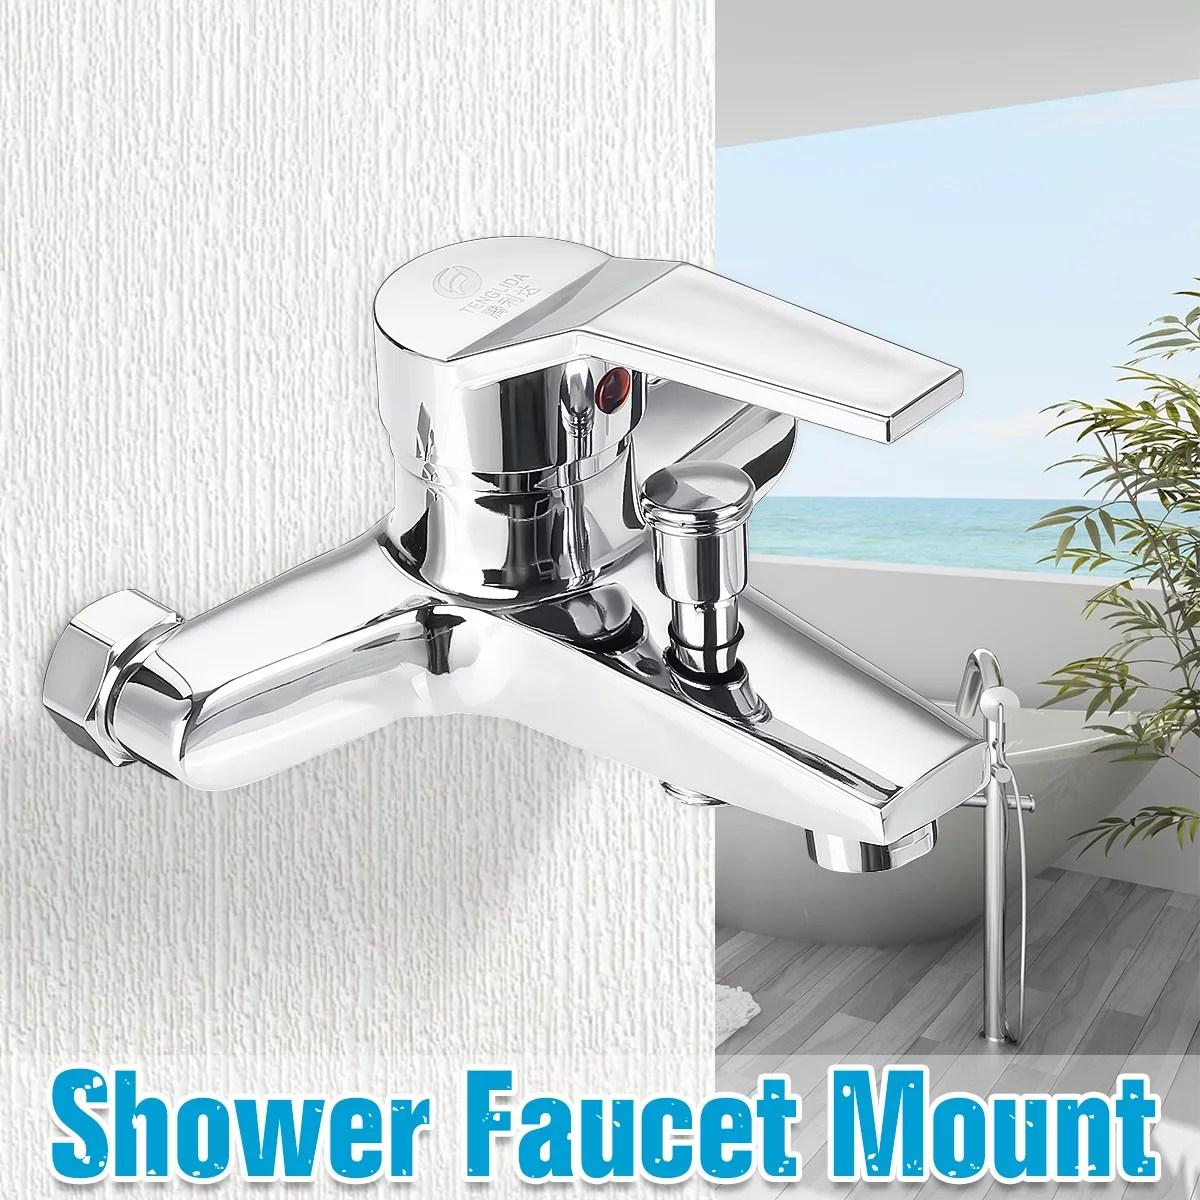 hot cold water bathroom faucets bathroom sink faucets bathtub tub shower faucet bath faucet